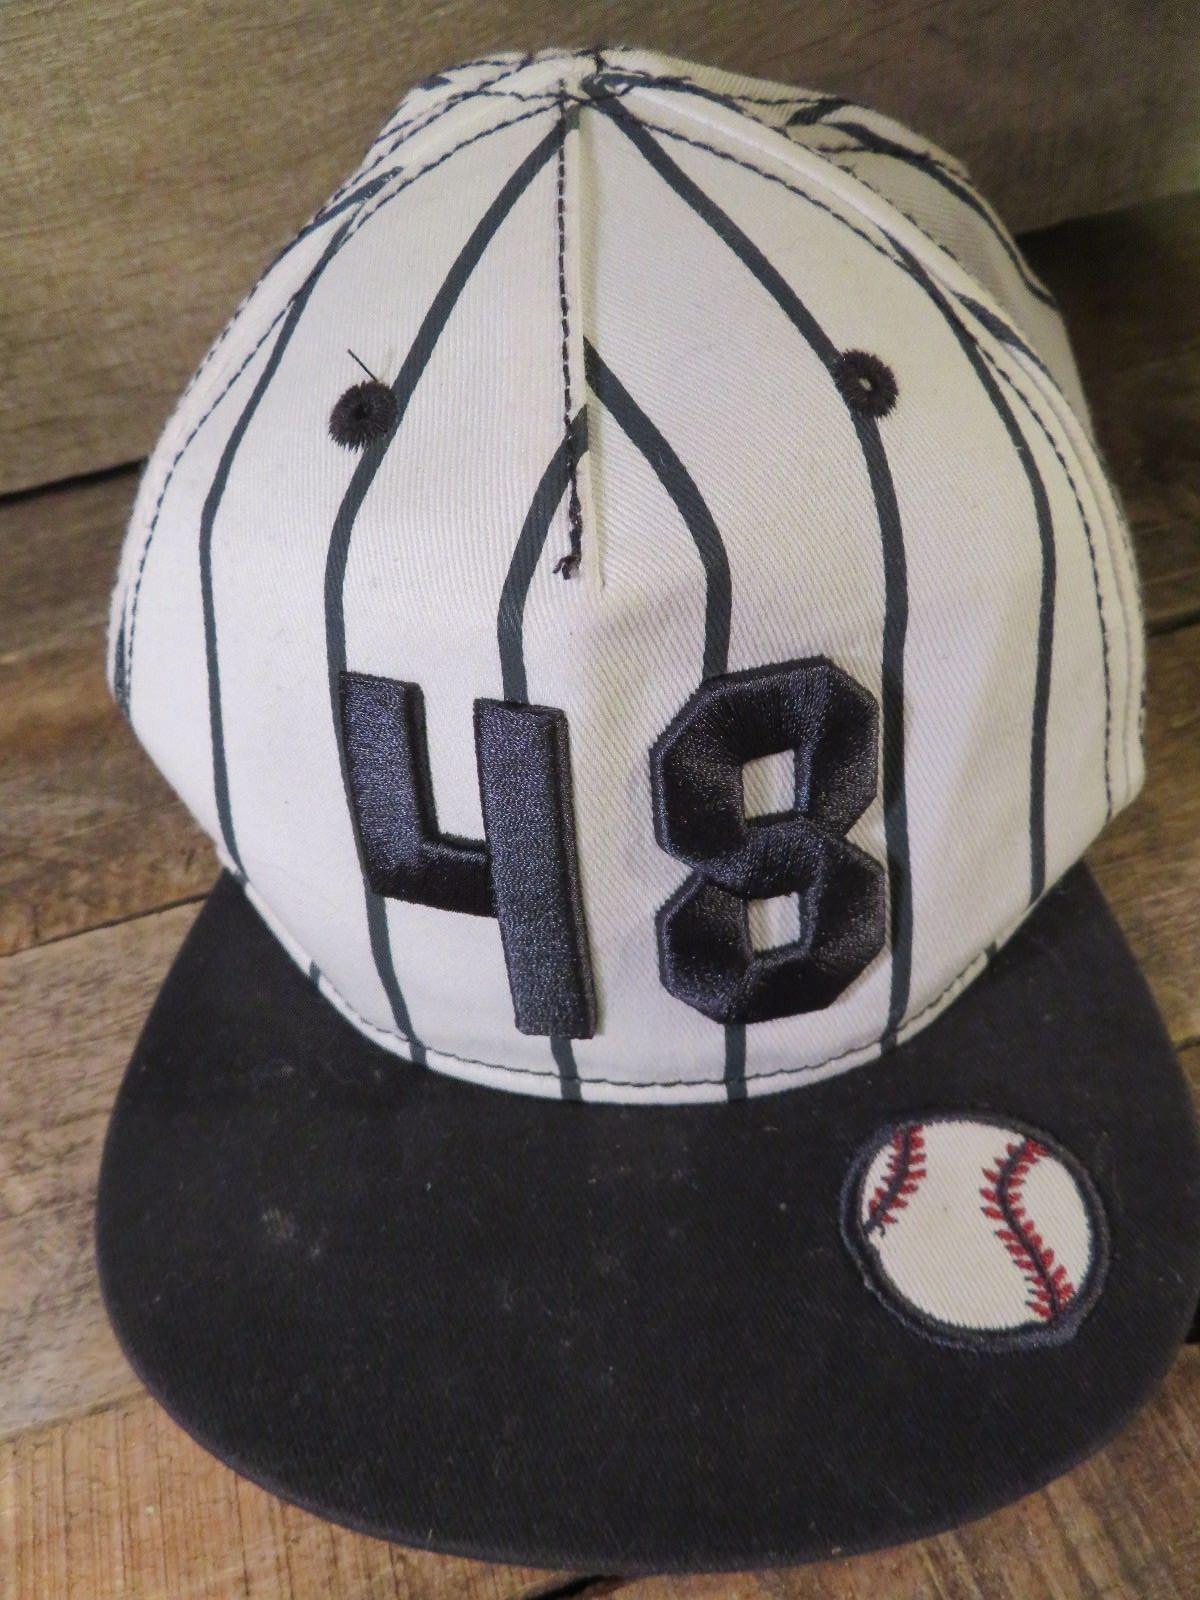 Béisbol Raya Diplomática #48 Infantil Gorra 12-18 M